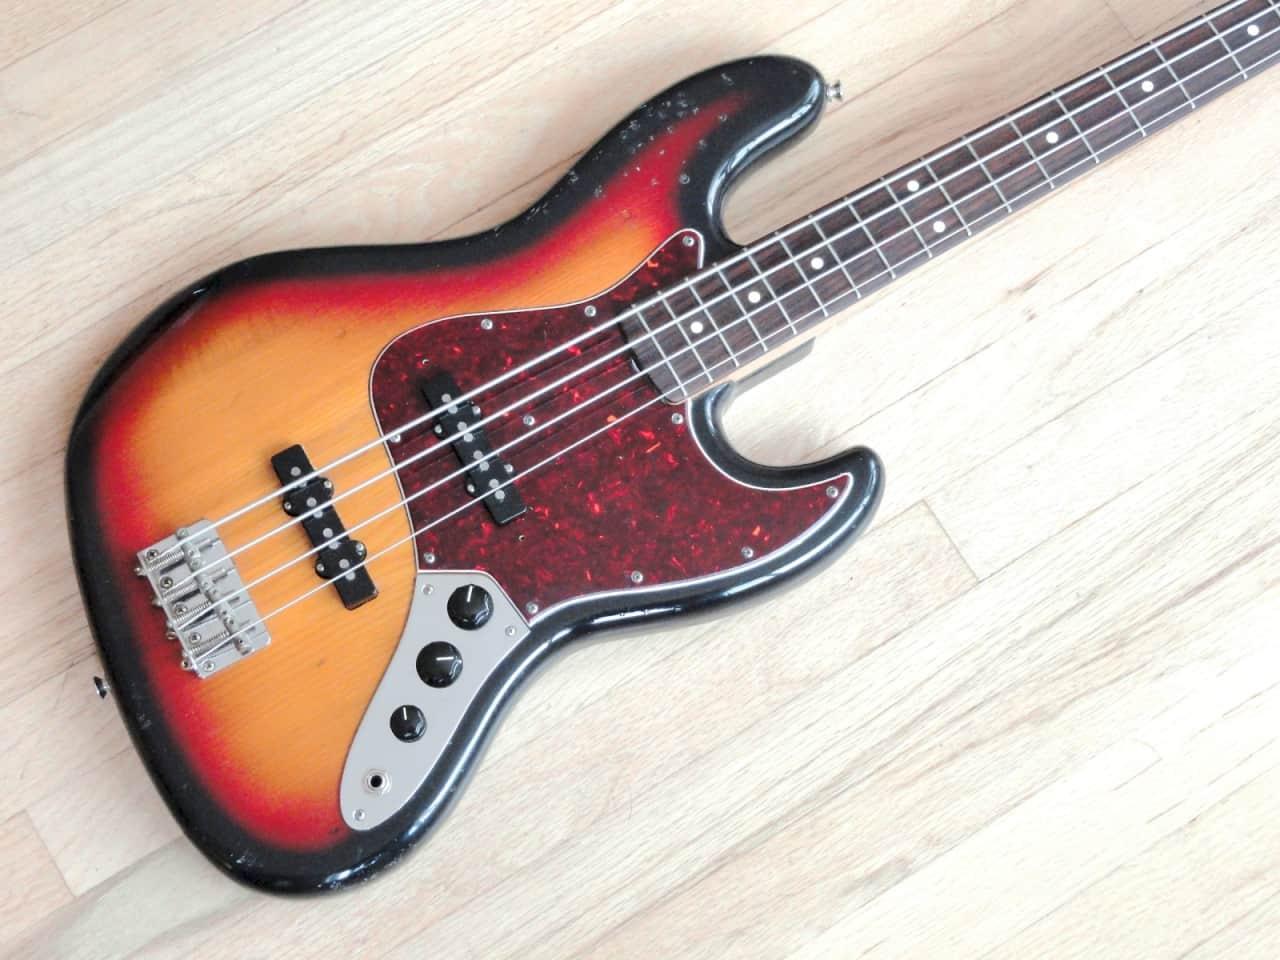 1982 squier jv 39 62 jazz bass sunburst japan mij fender reverb. Black Bedroom Furniture Sets. Home Design Ideas